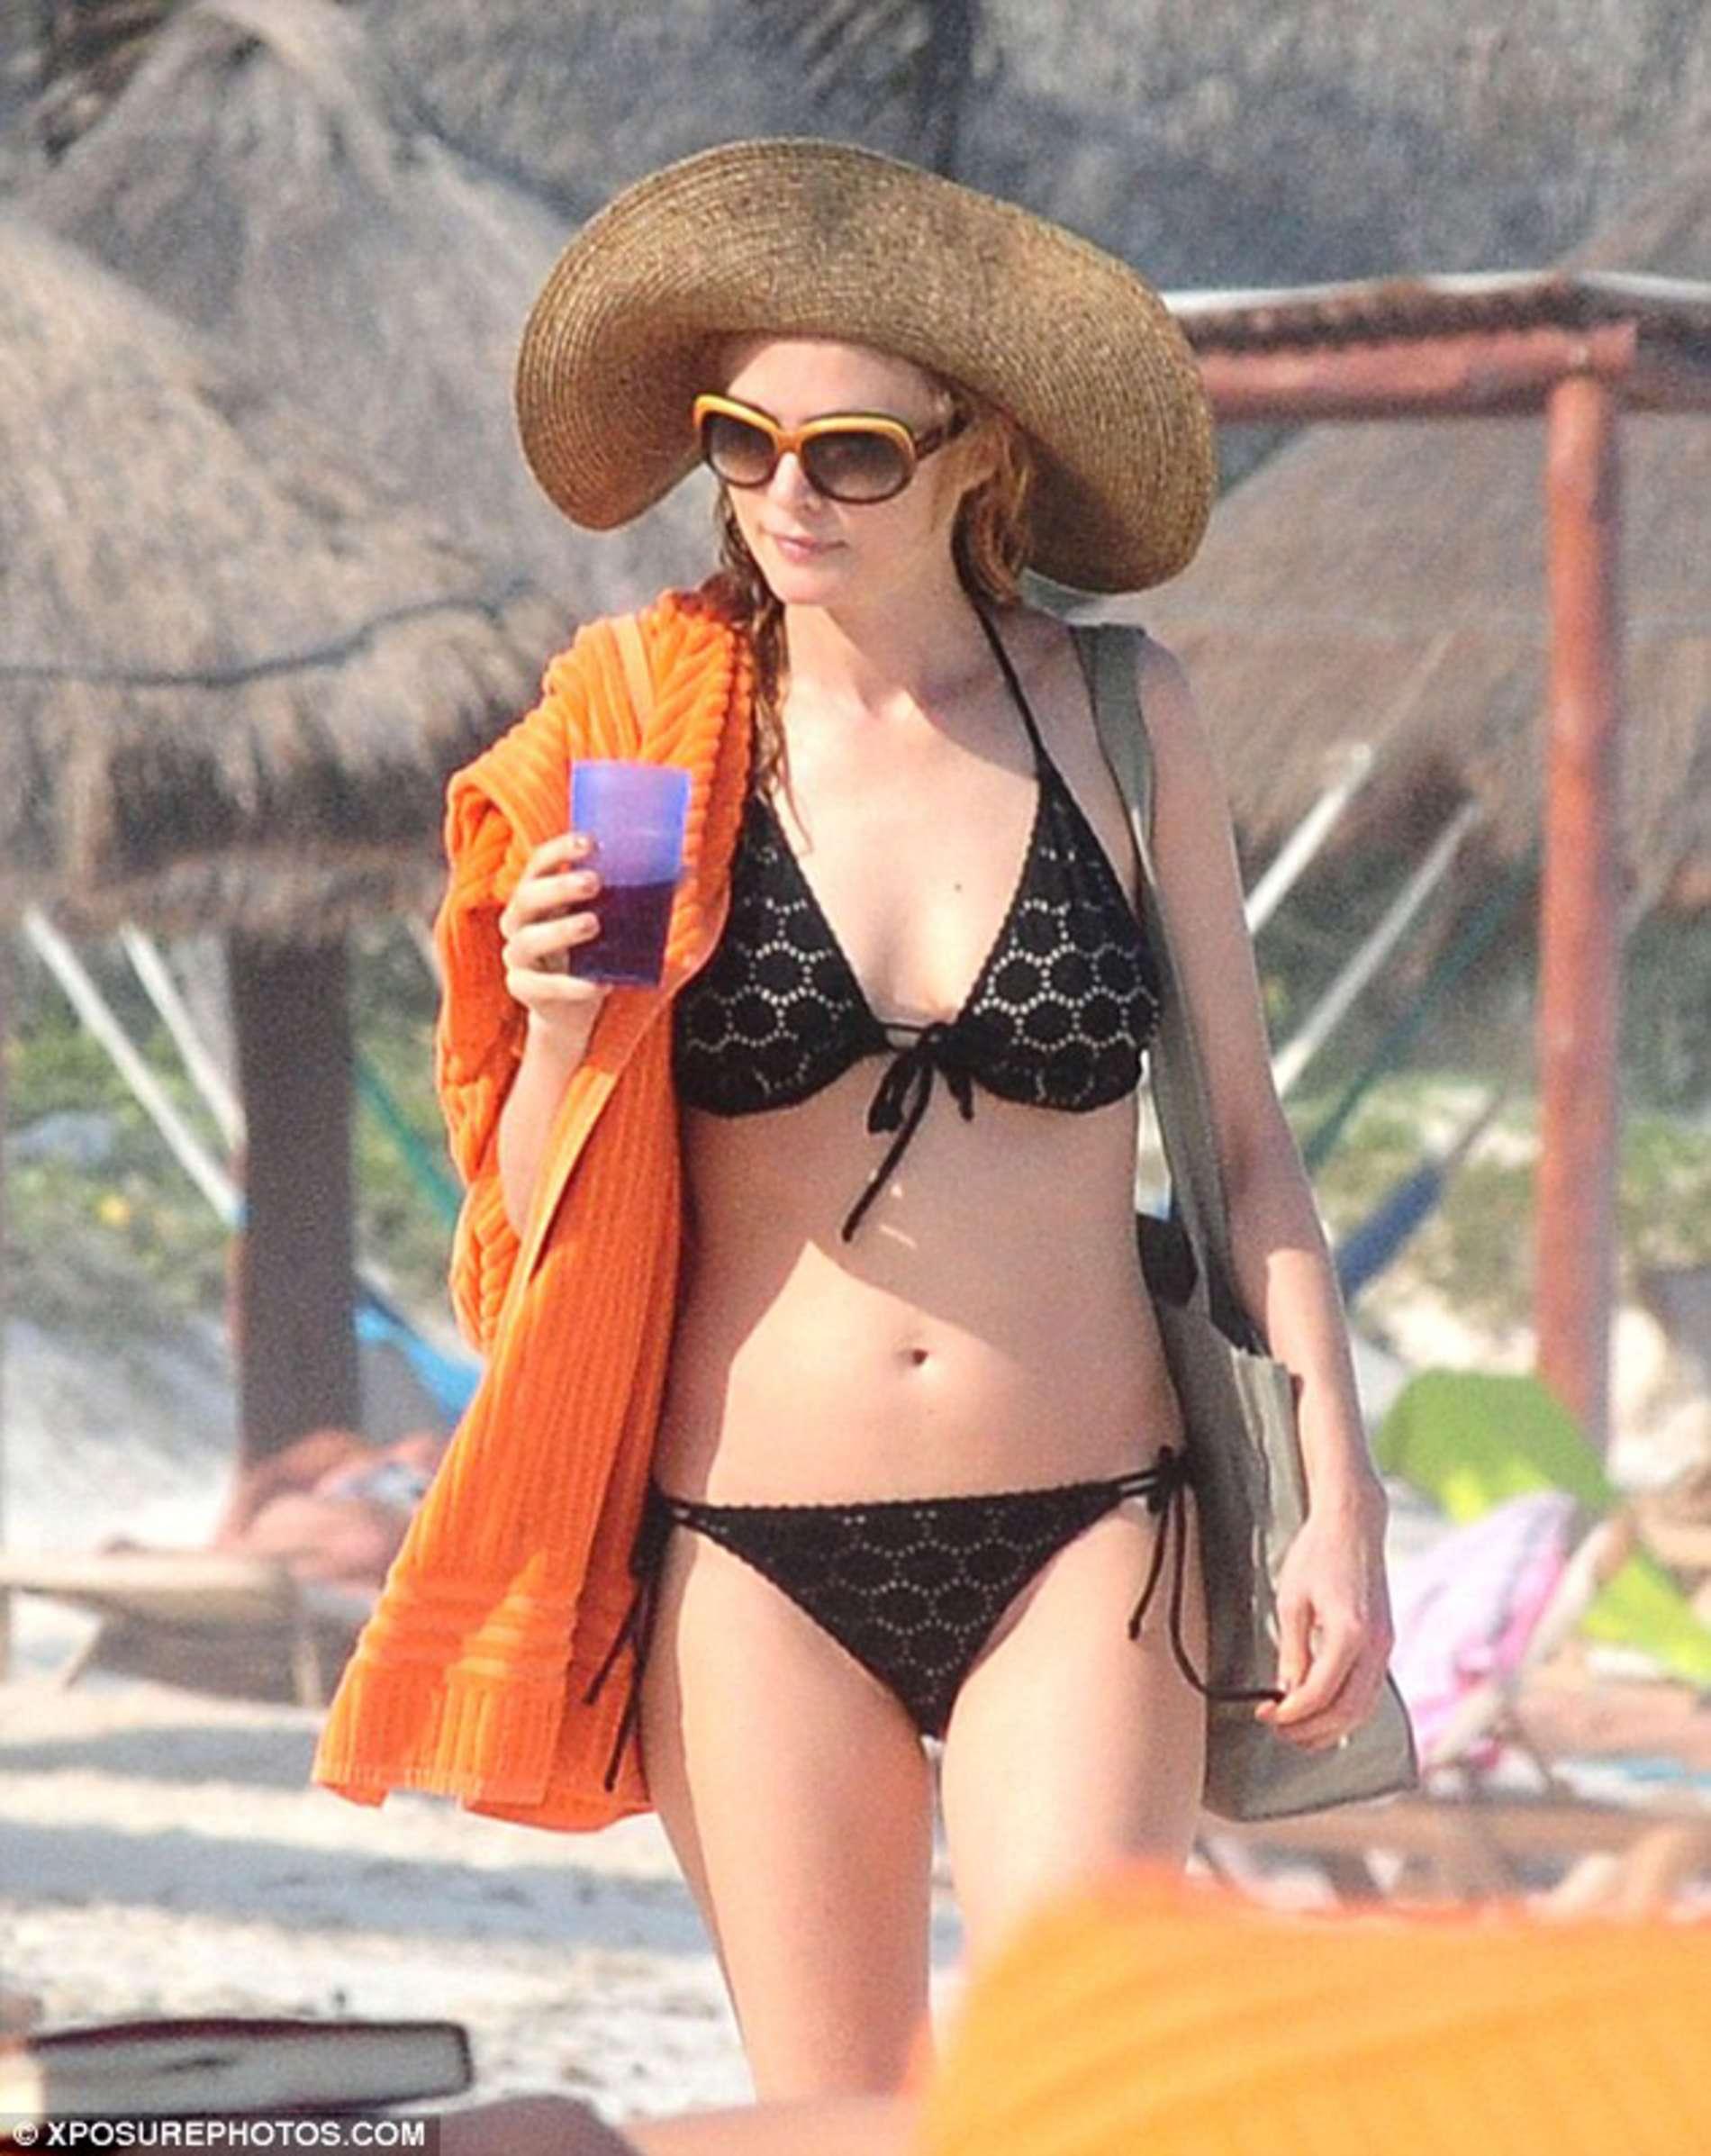 Heather graham red sox bikini